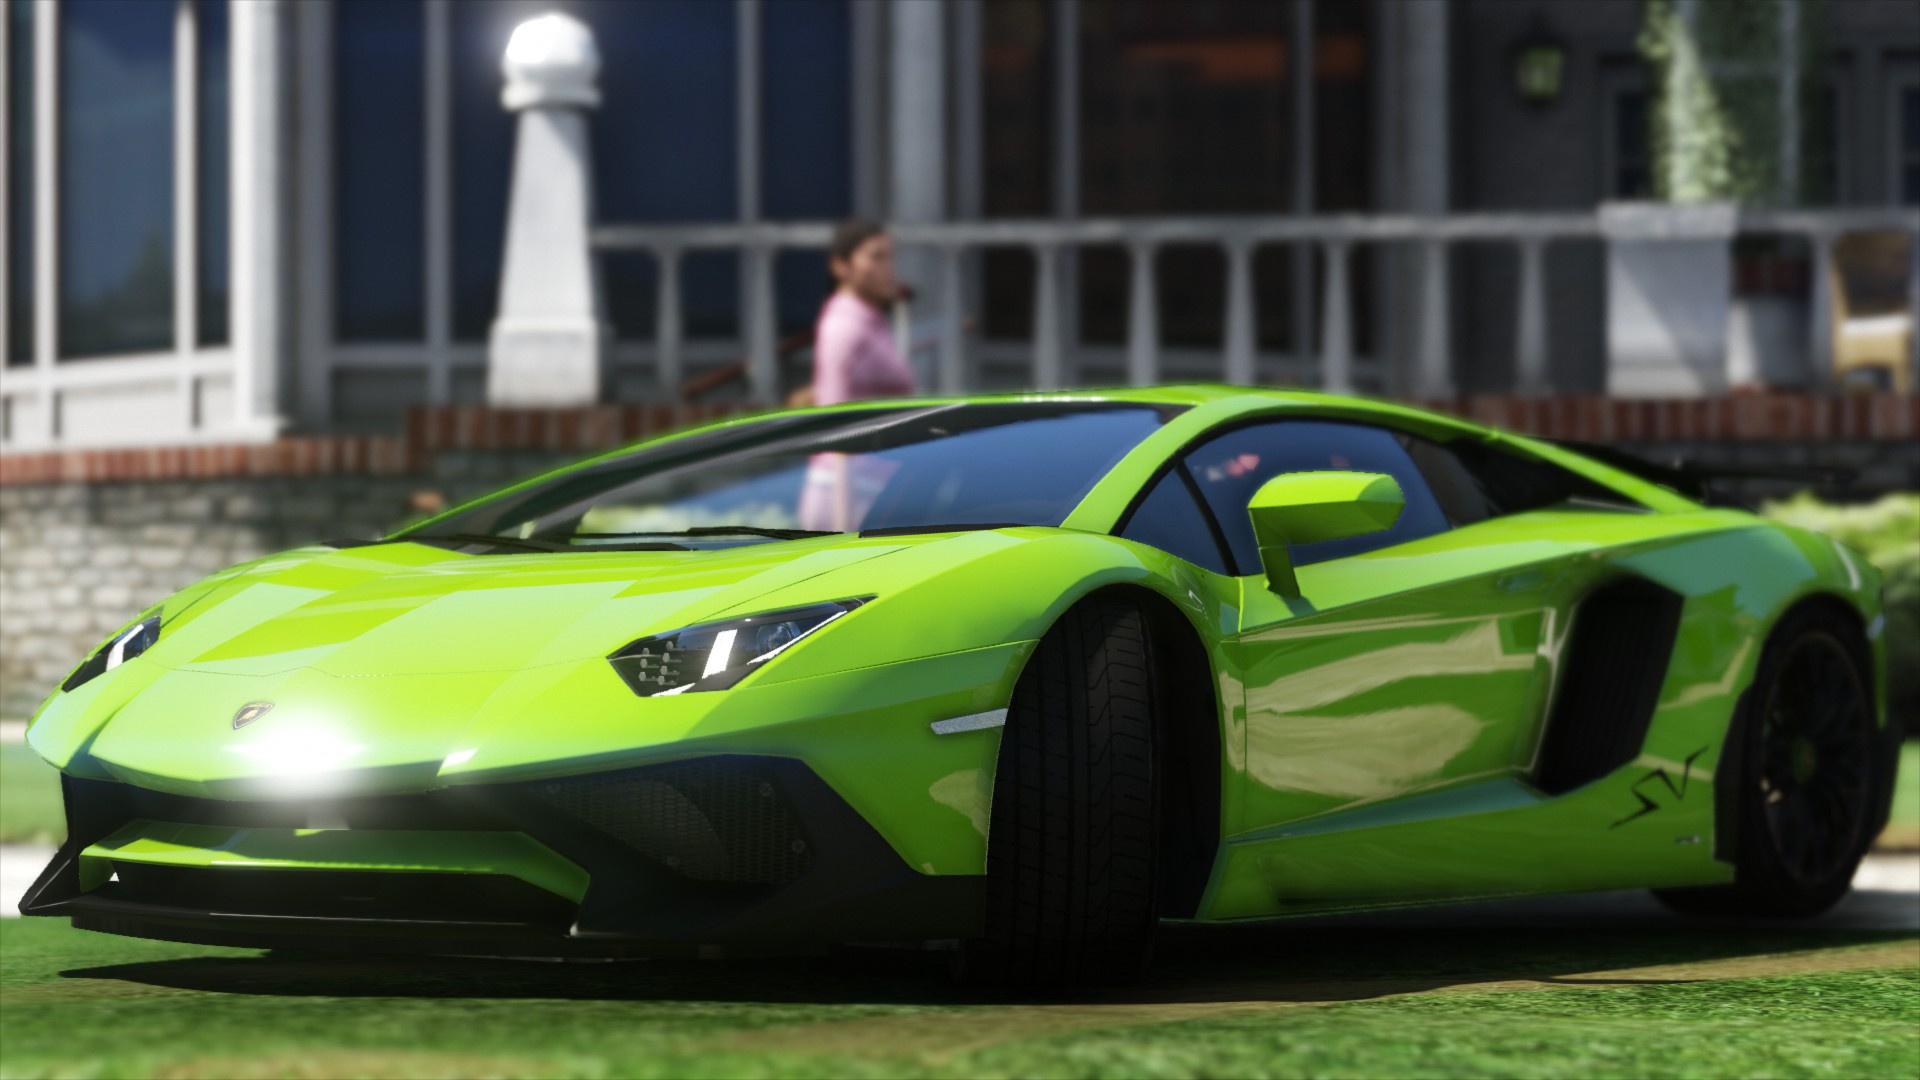 Lamborghini Veneno Livery >> Lamborghini Gallardo Tuning Crystal City Car - ideasplataforma.com